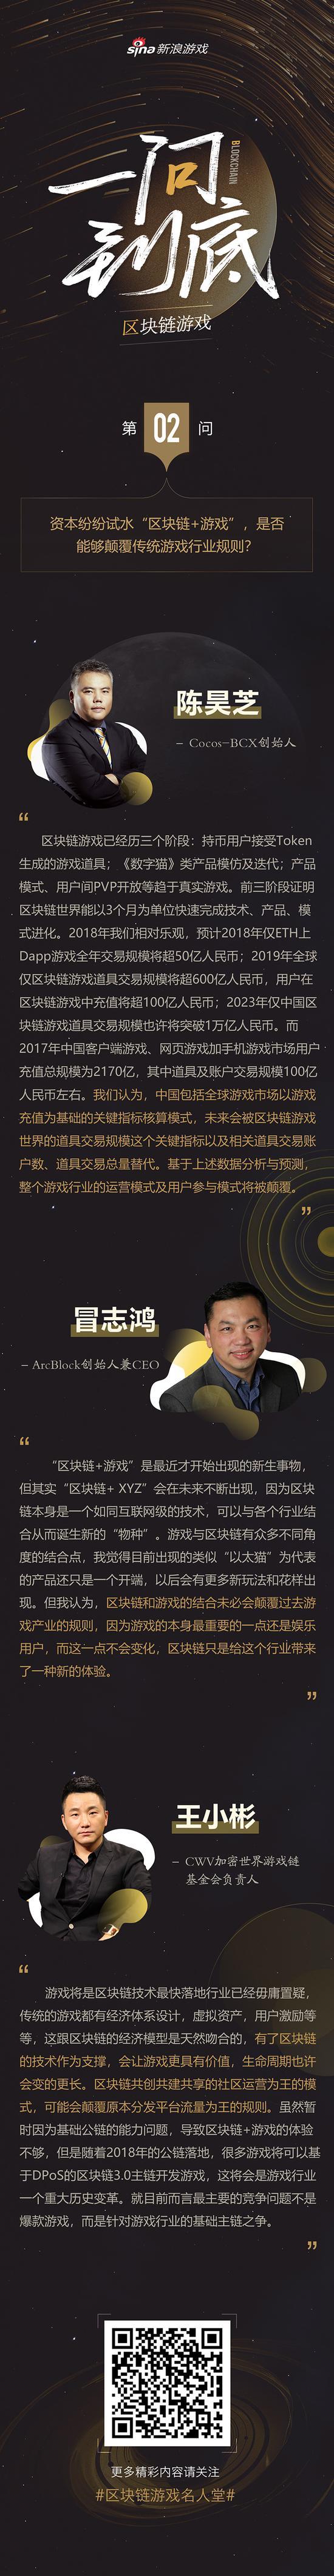 Cocos-BCX创始人陈昊芝